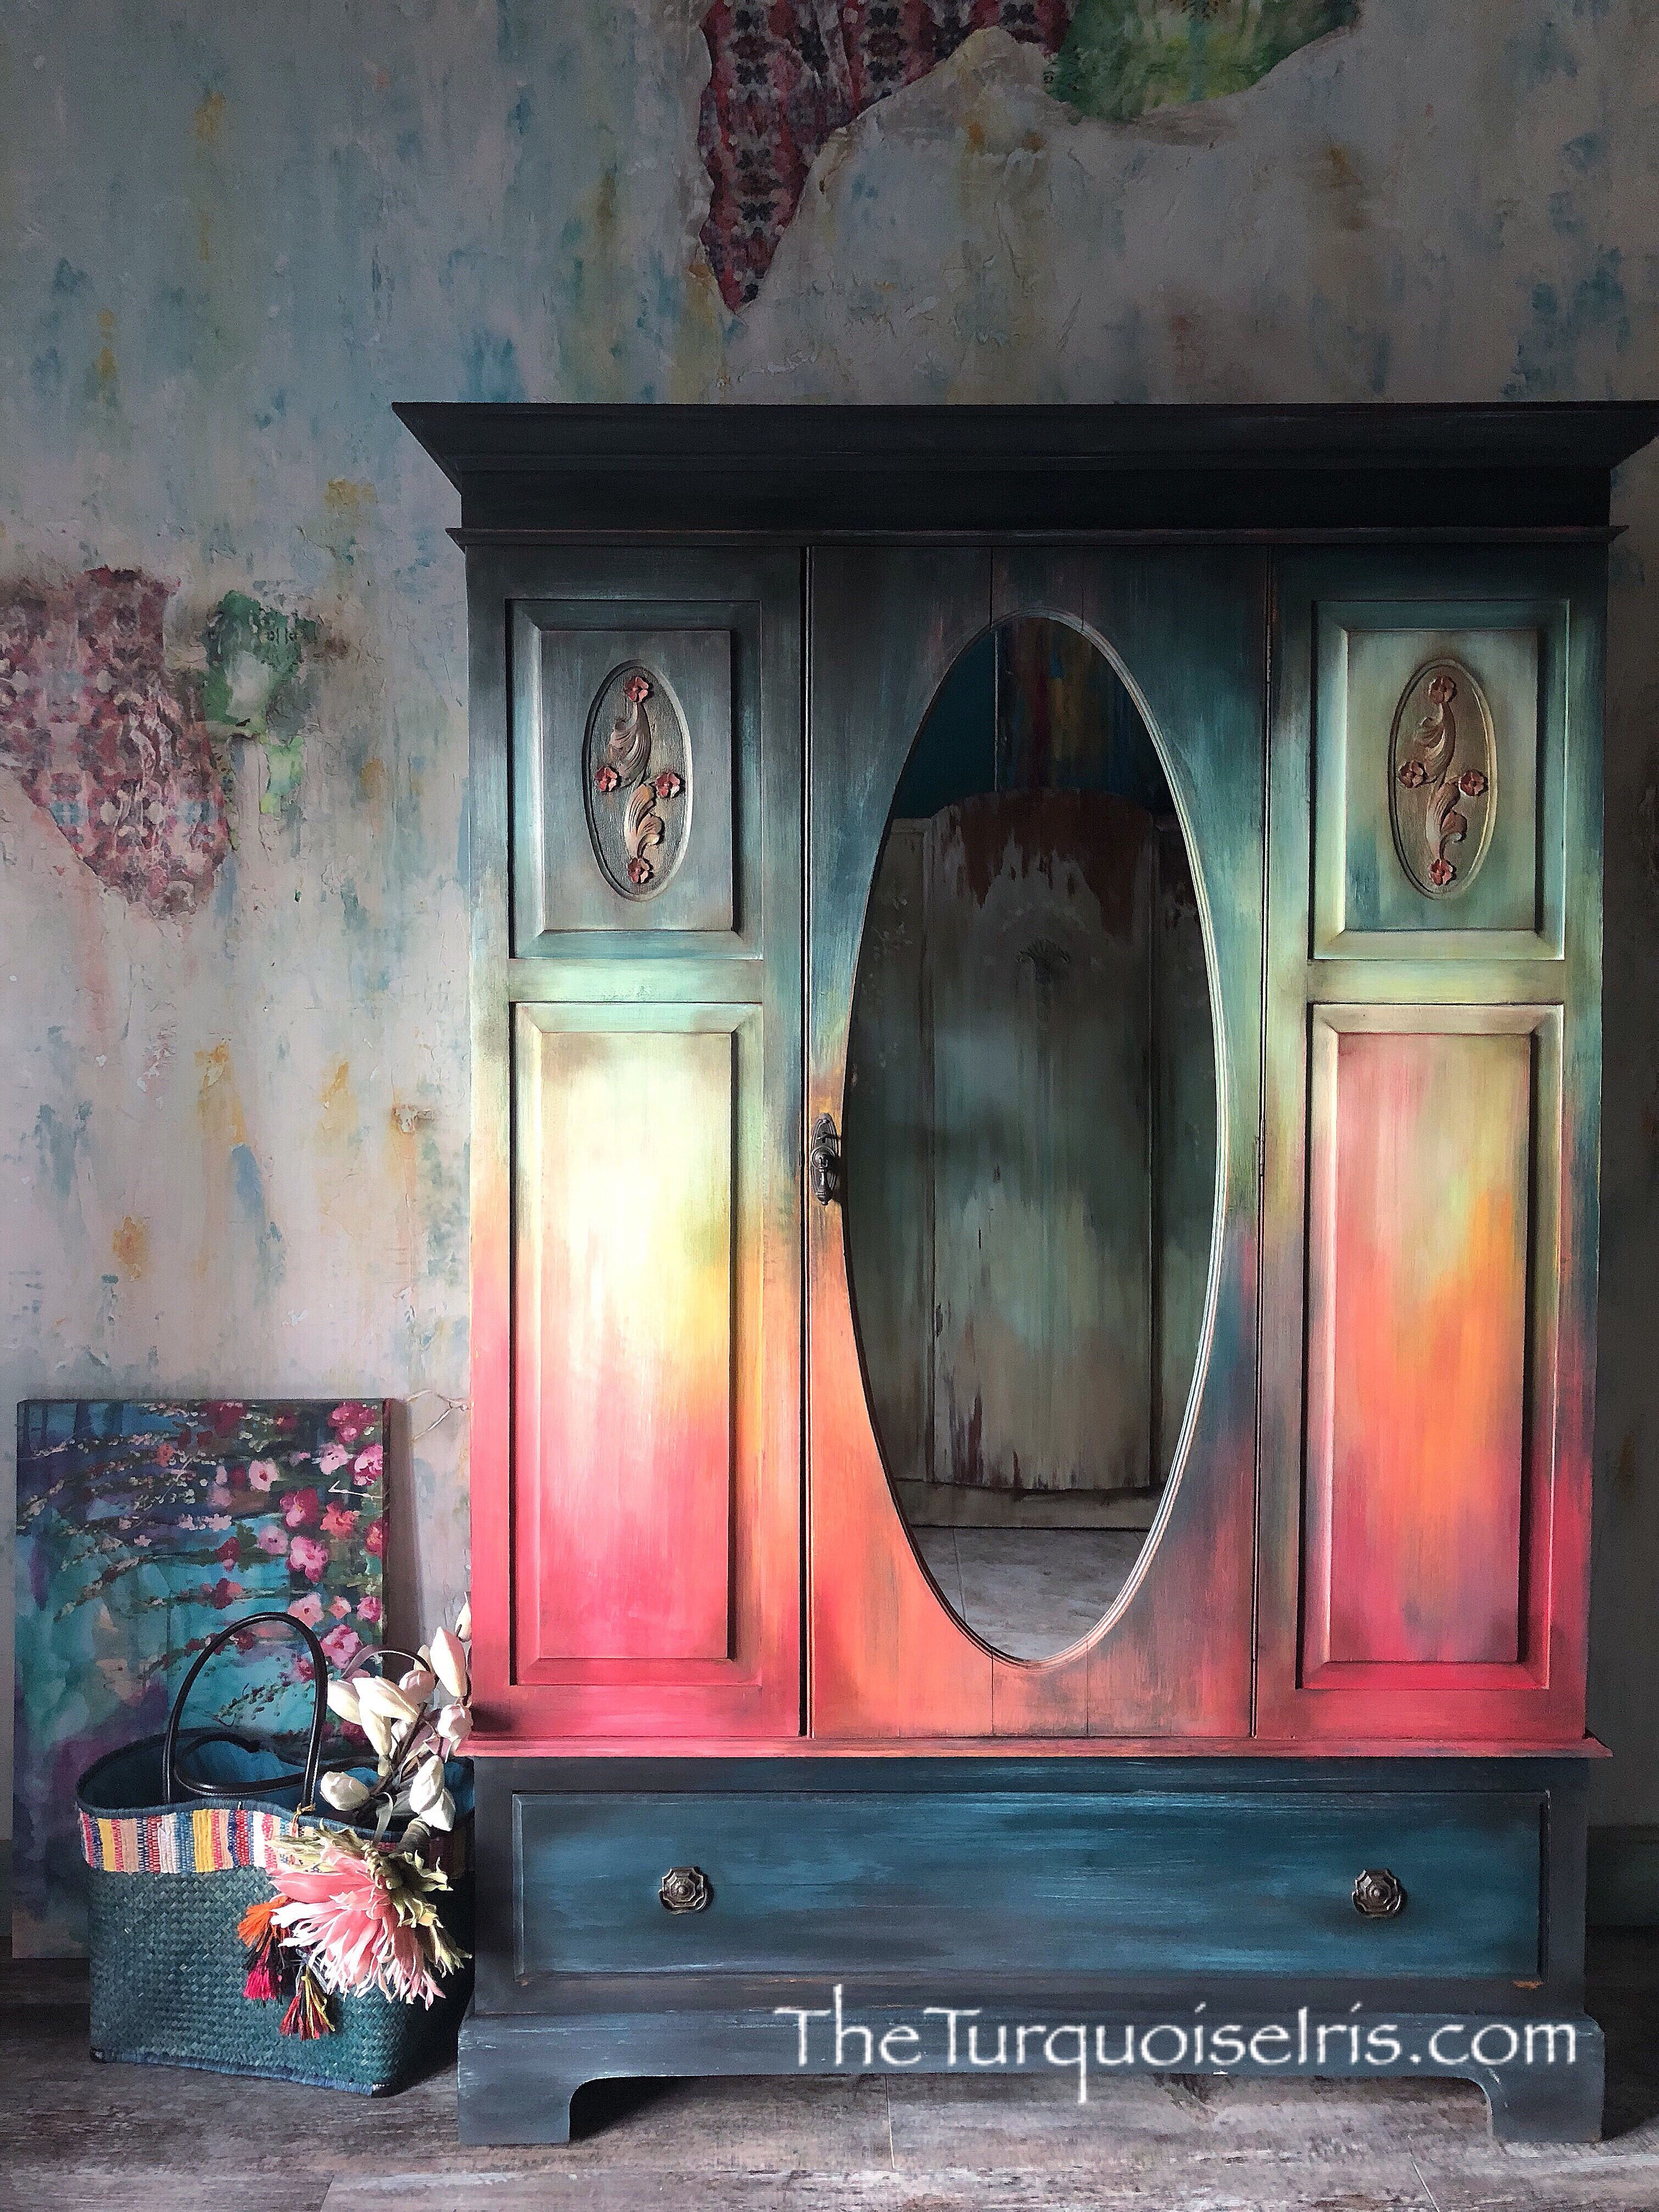 Dionne Woods #furniturepainter #furnitureartist #vintagefurniture #paintedfurniture #loveart #oklahomaartist #okcartist #oneofakind #theturquoiseiris #handpainted #claybasedpaint #etsyshop #etsyseller #createallday #creativeentreprenuer #dotheDionne #colormovement #DIYpaint #debisdesigndiary